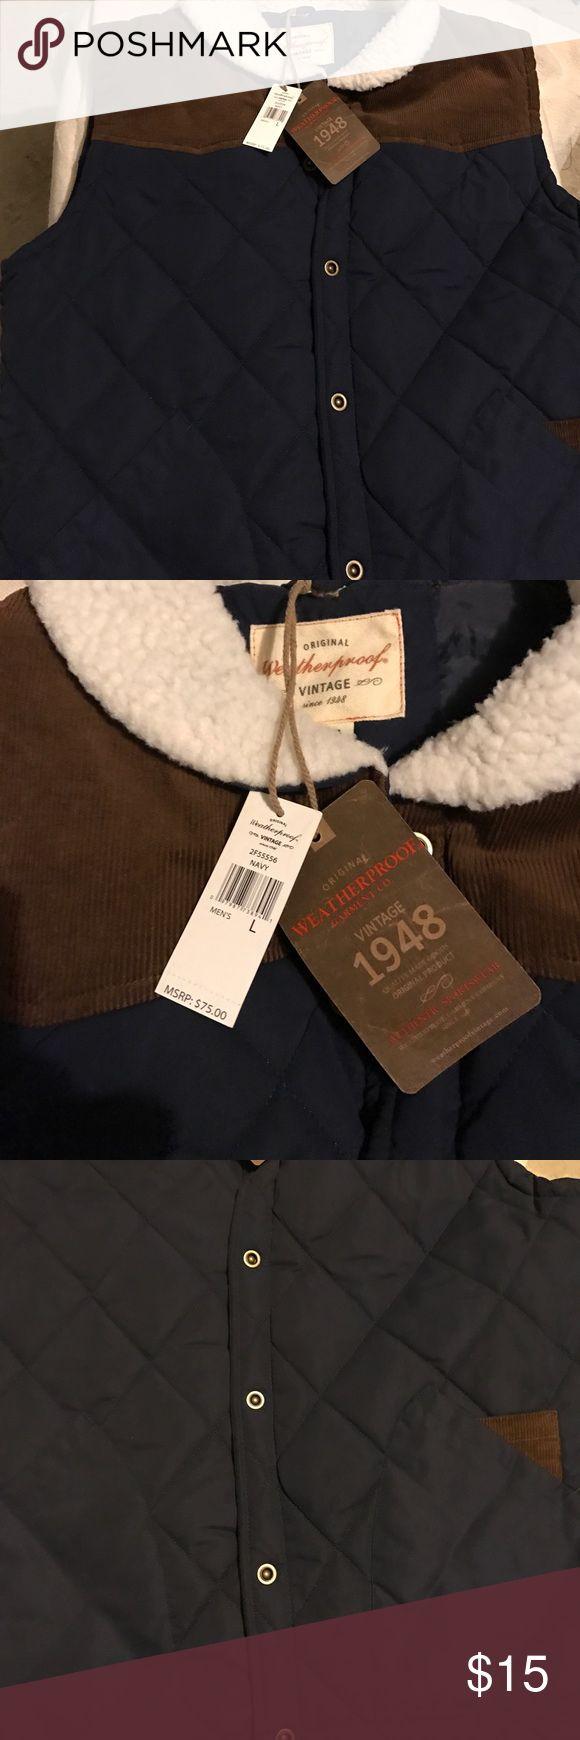 Men's puffer vest by vintage 1948 Great men's  puffer vest by vintage 1948 Vintage Jackets & Coats Vests